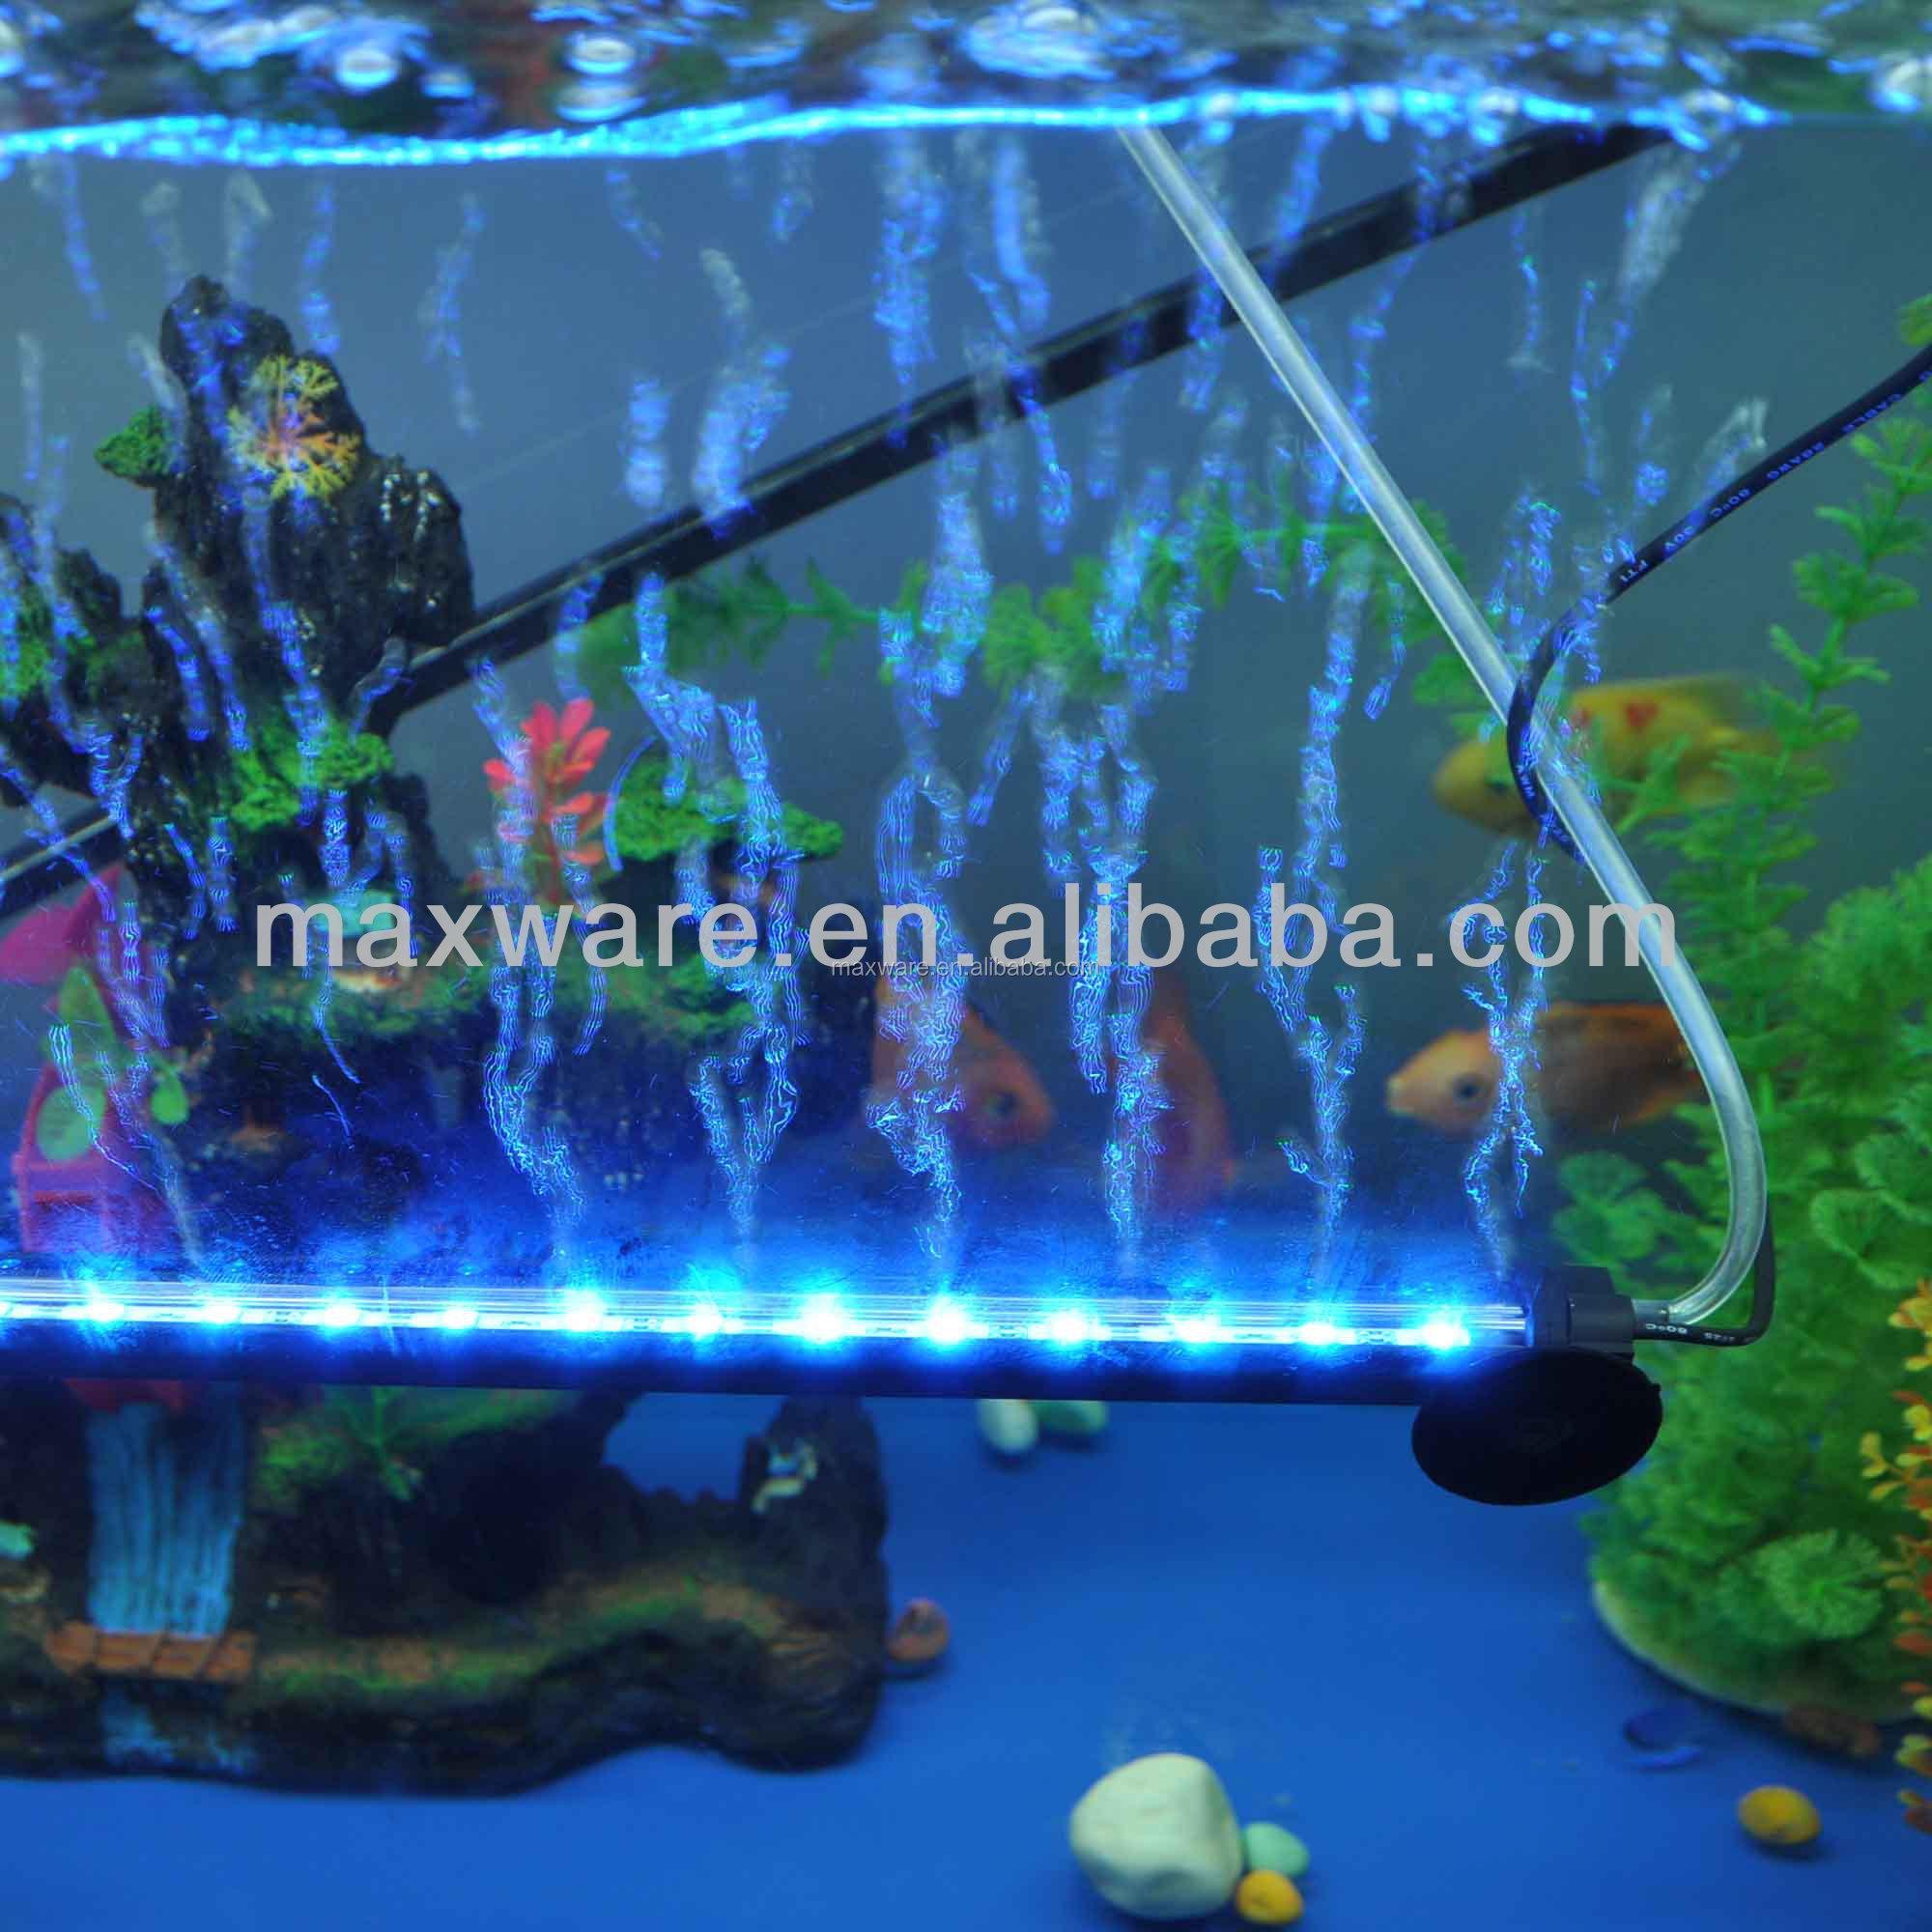 Make You More Colorful Waterproof Aquarium Fish Tank Bubble Lights ...